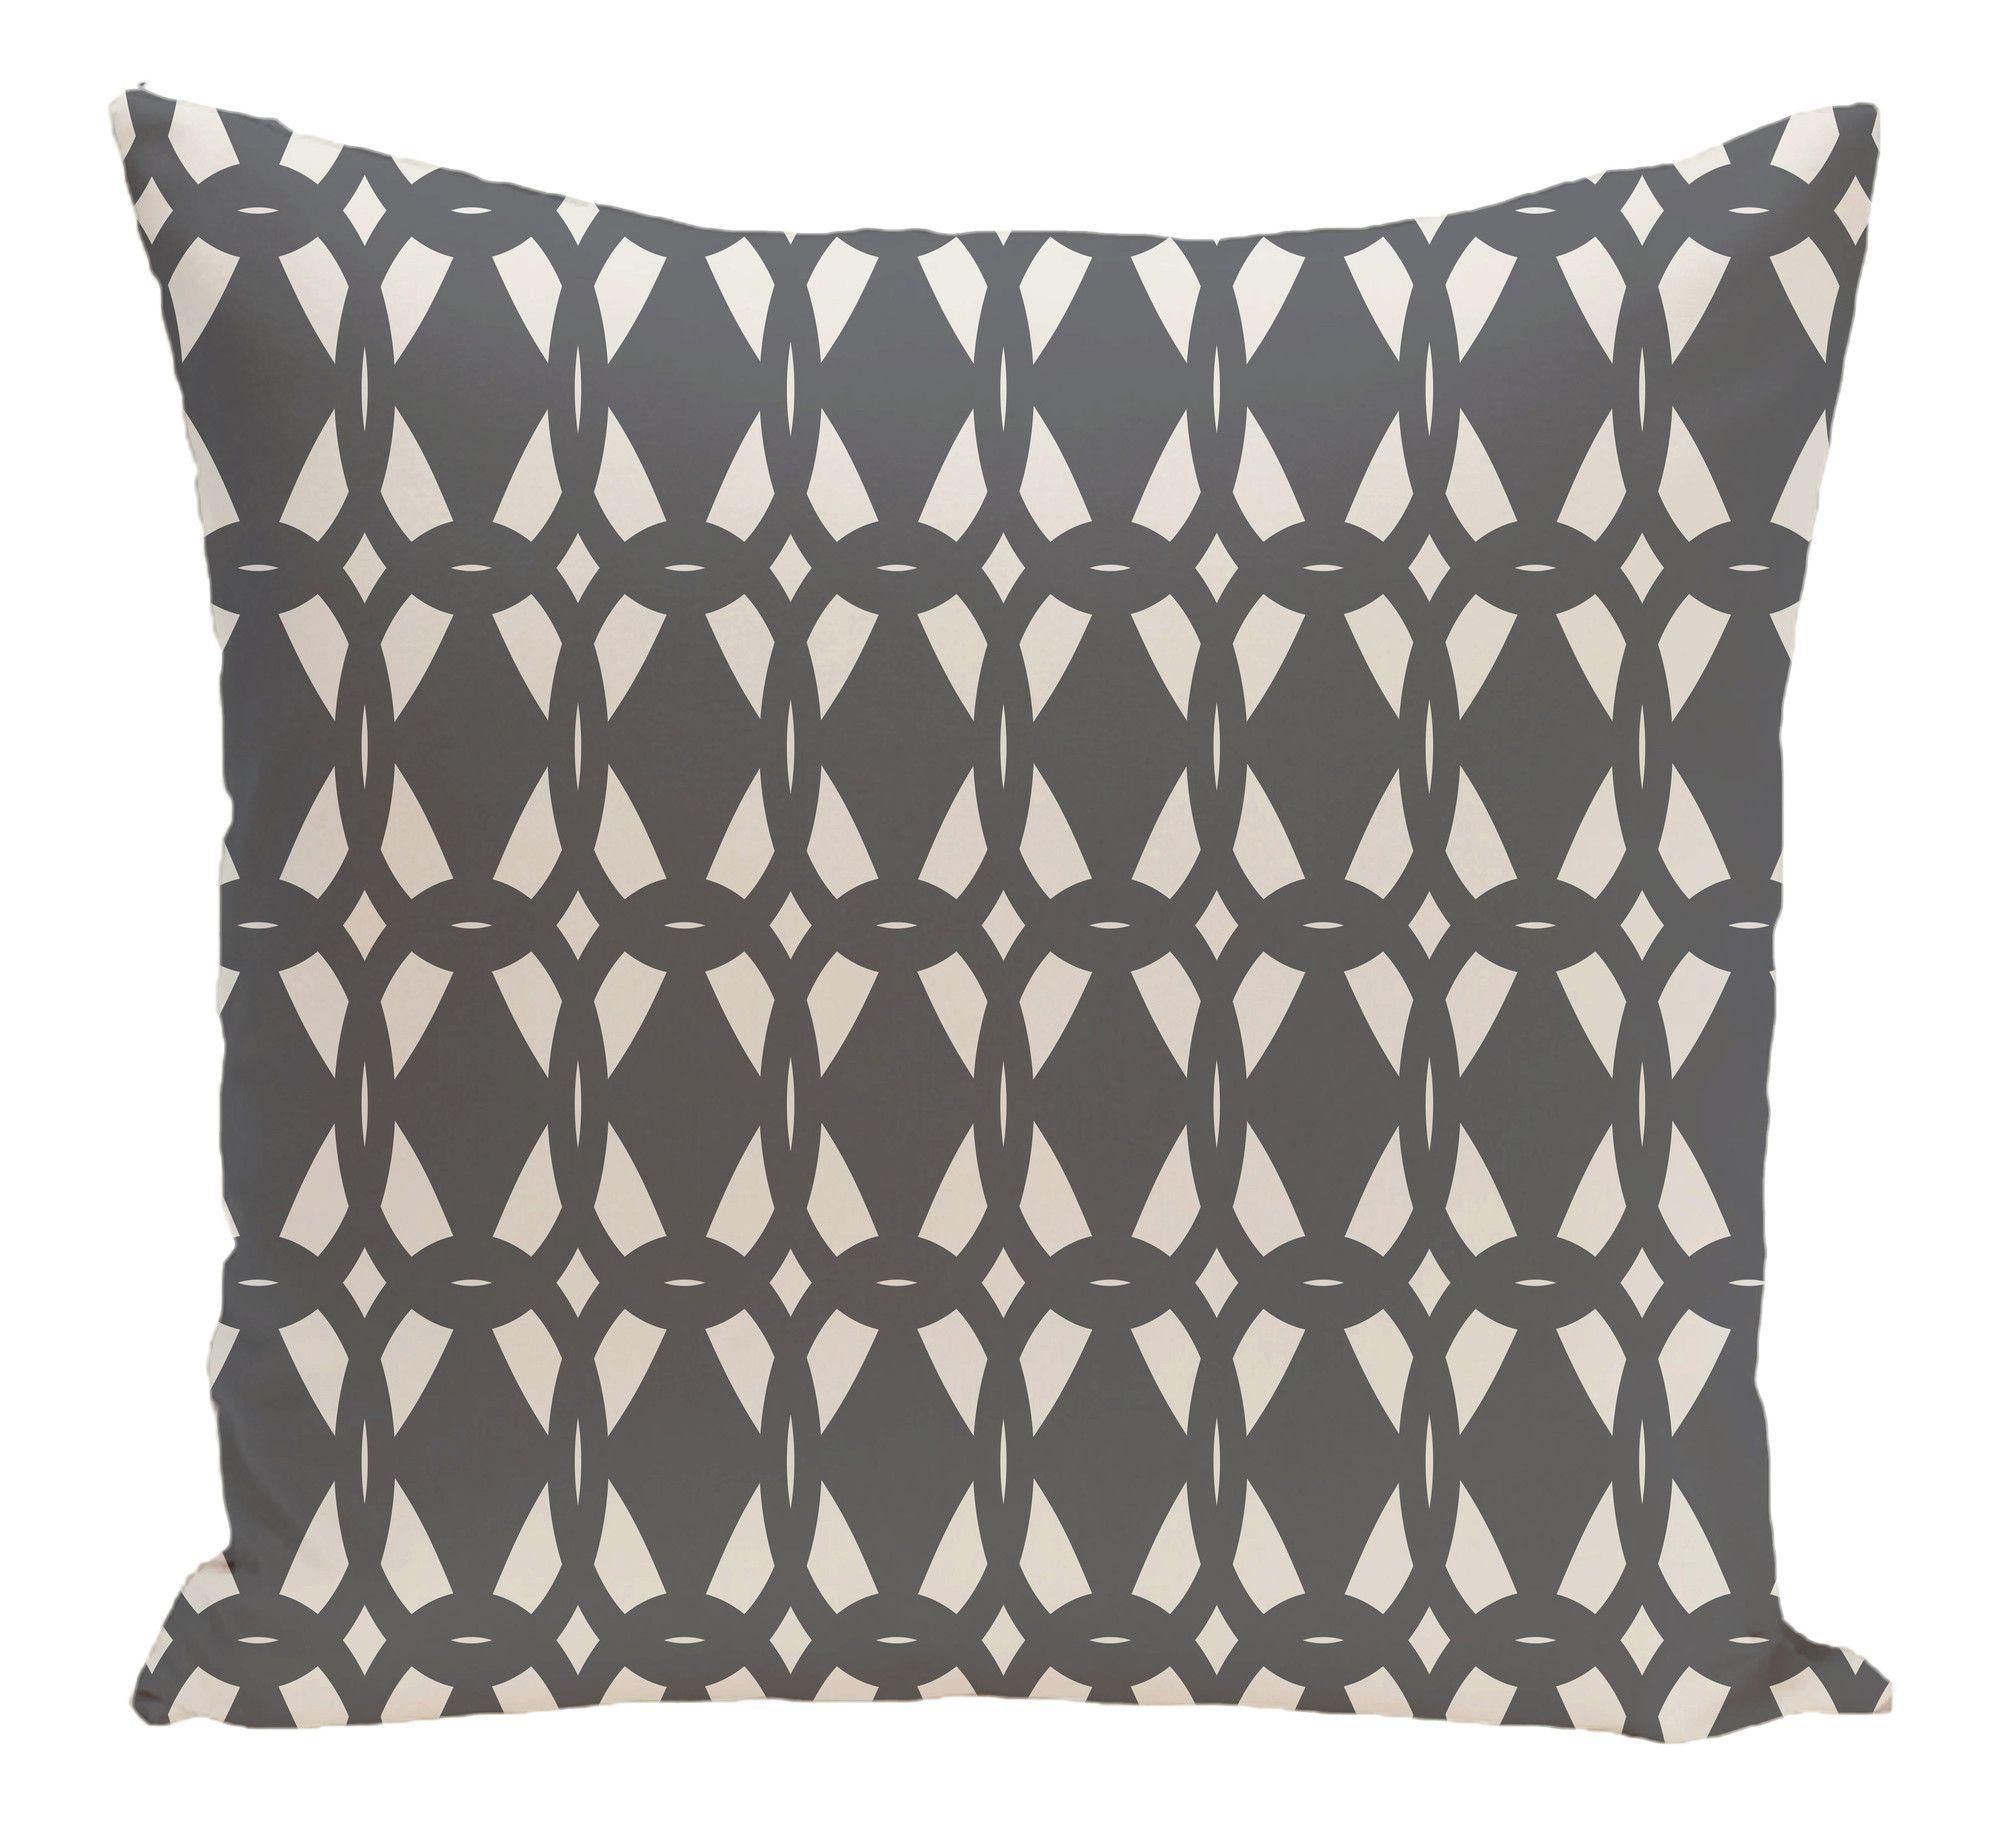 Boyles geocraze geometric print floor pillow products pinterest